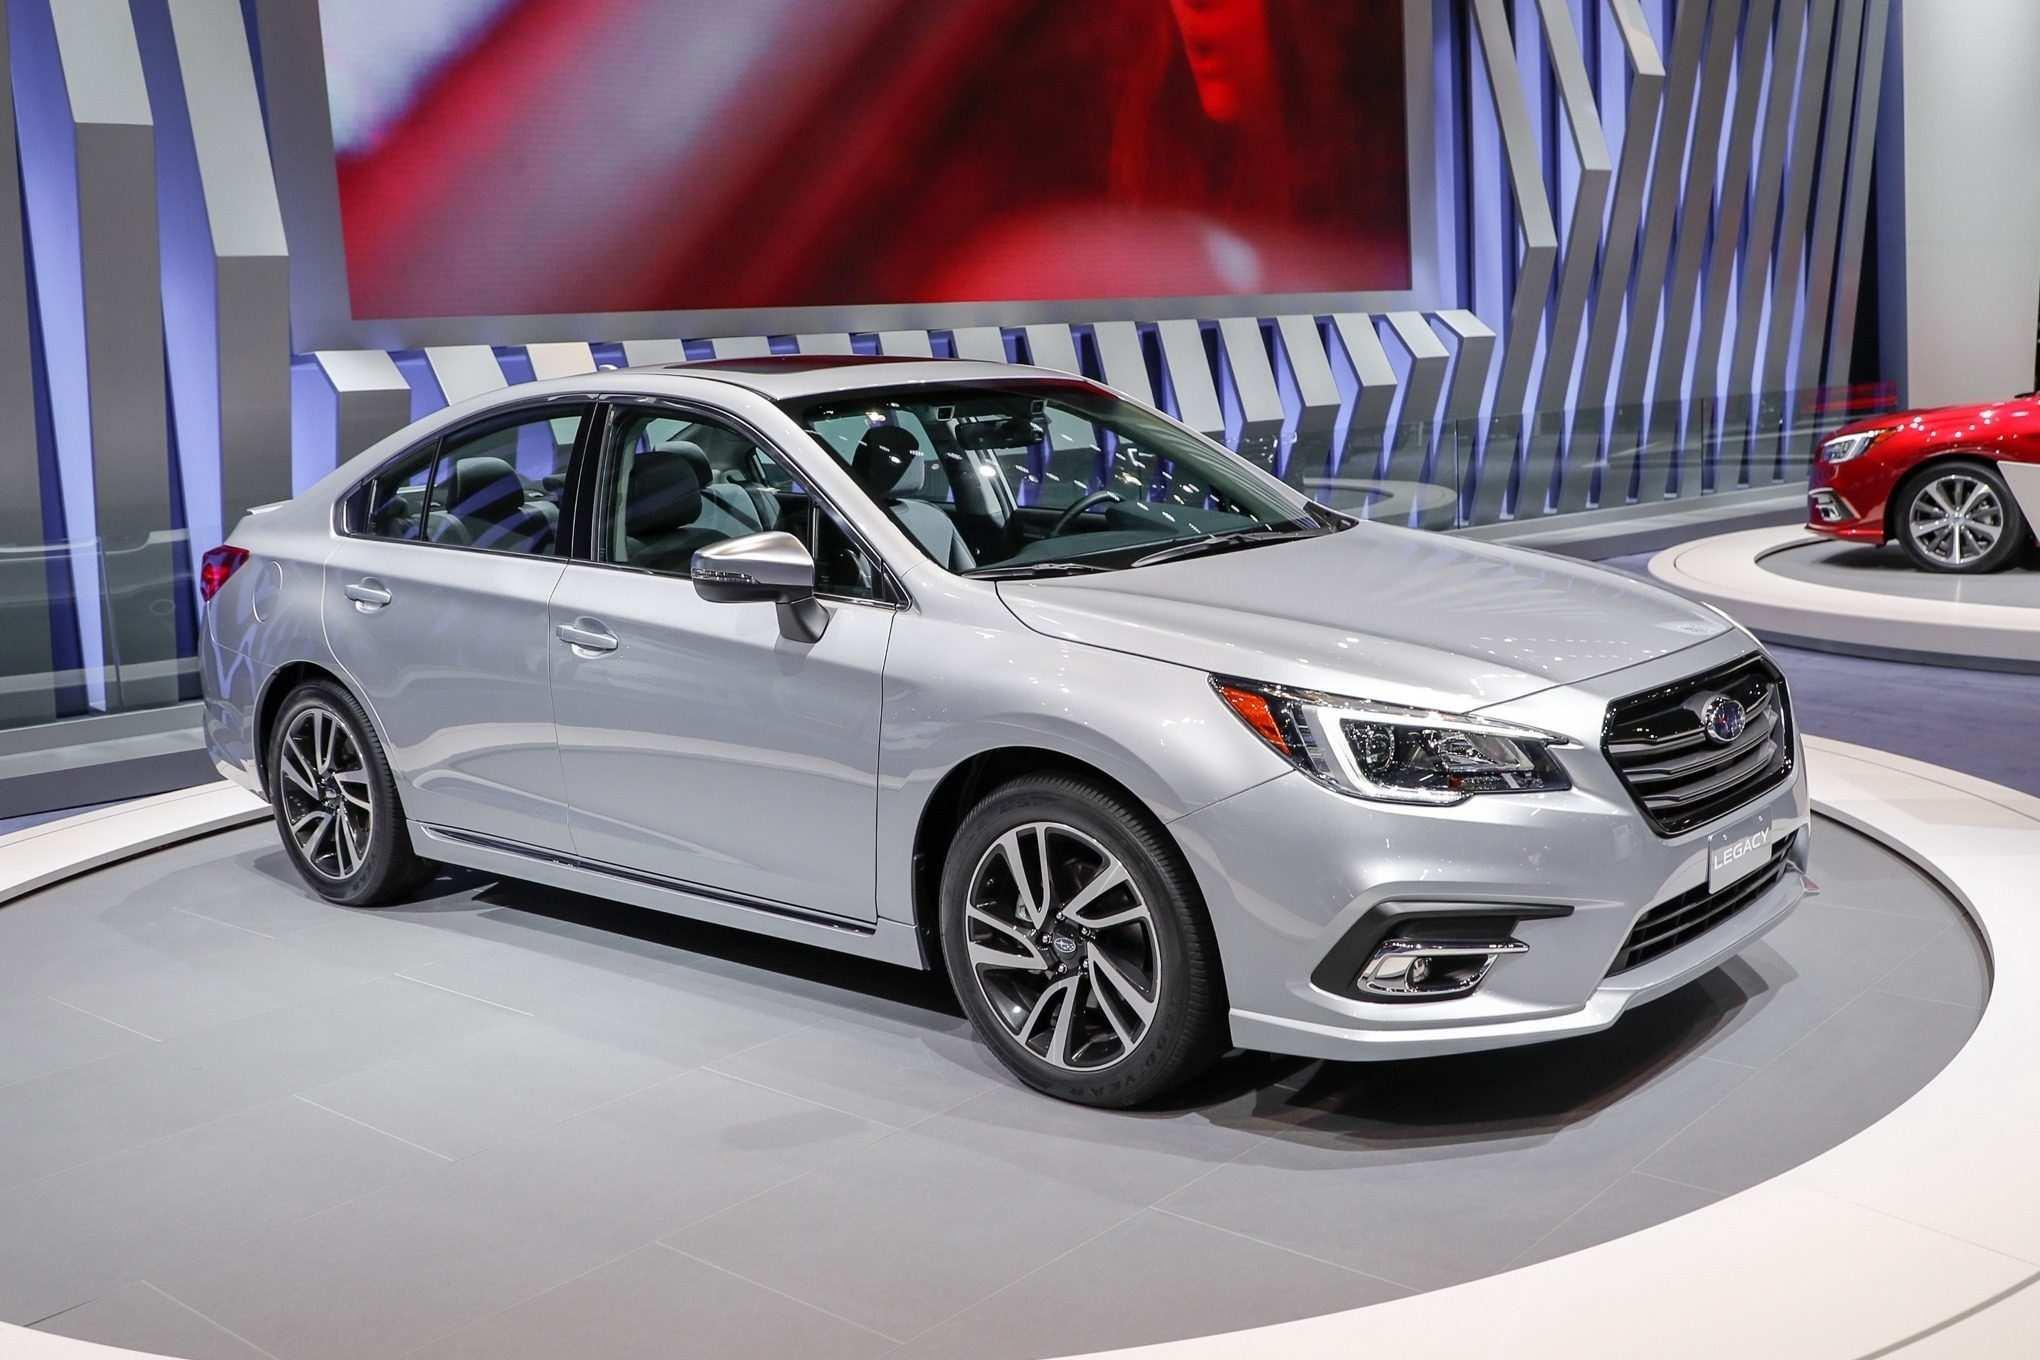 85 All New 2019 Subaru Legacy Gt Pricing for 2019 Subaru Legacy Gt